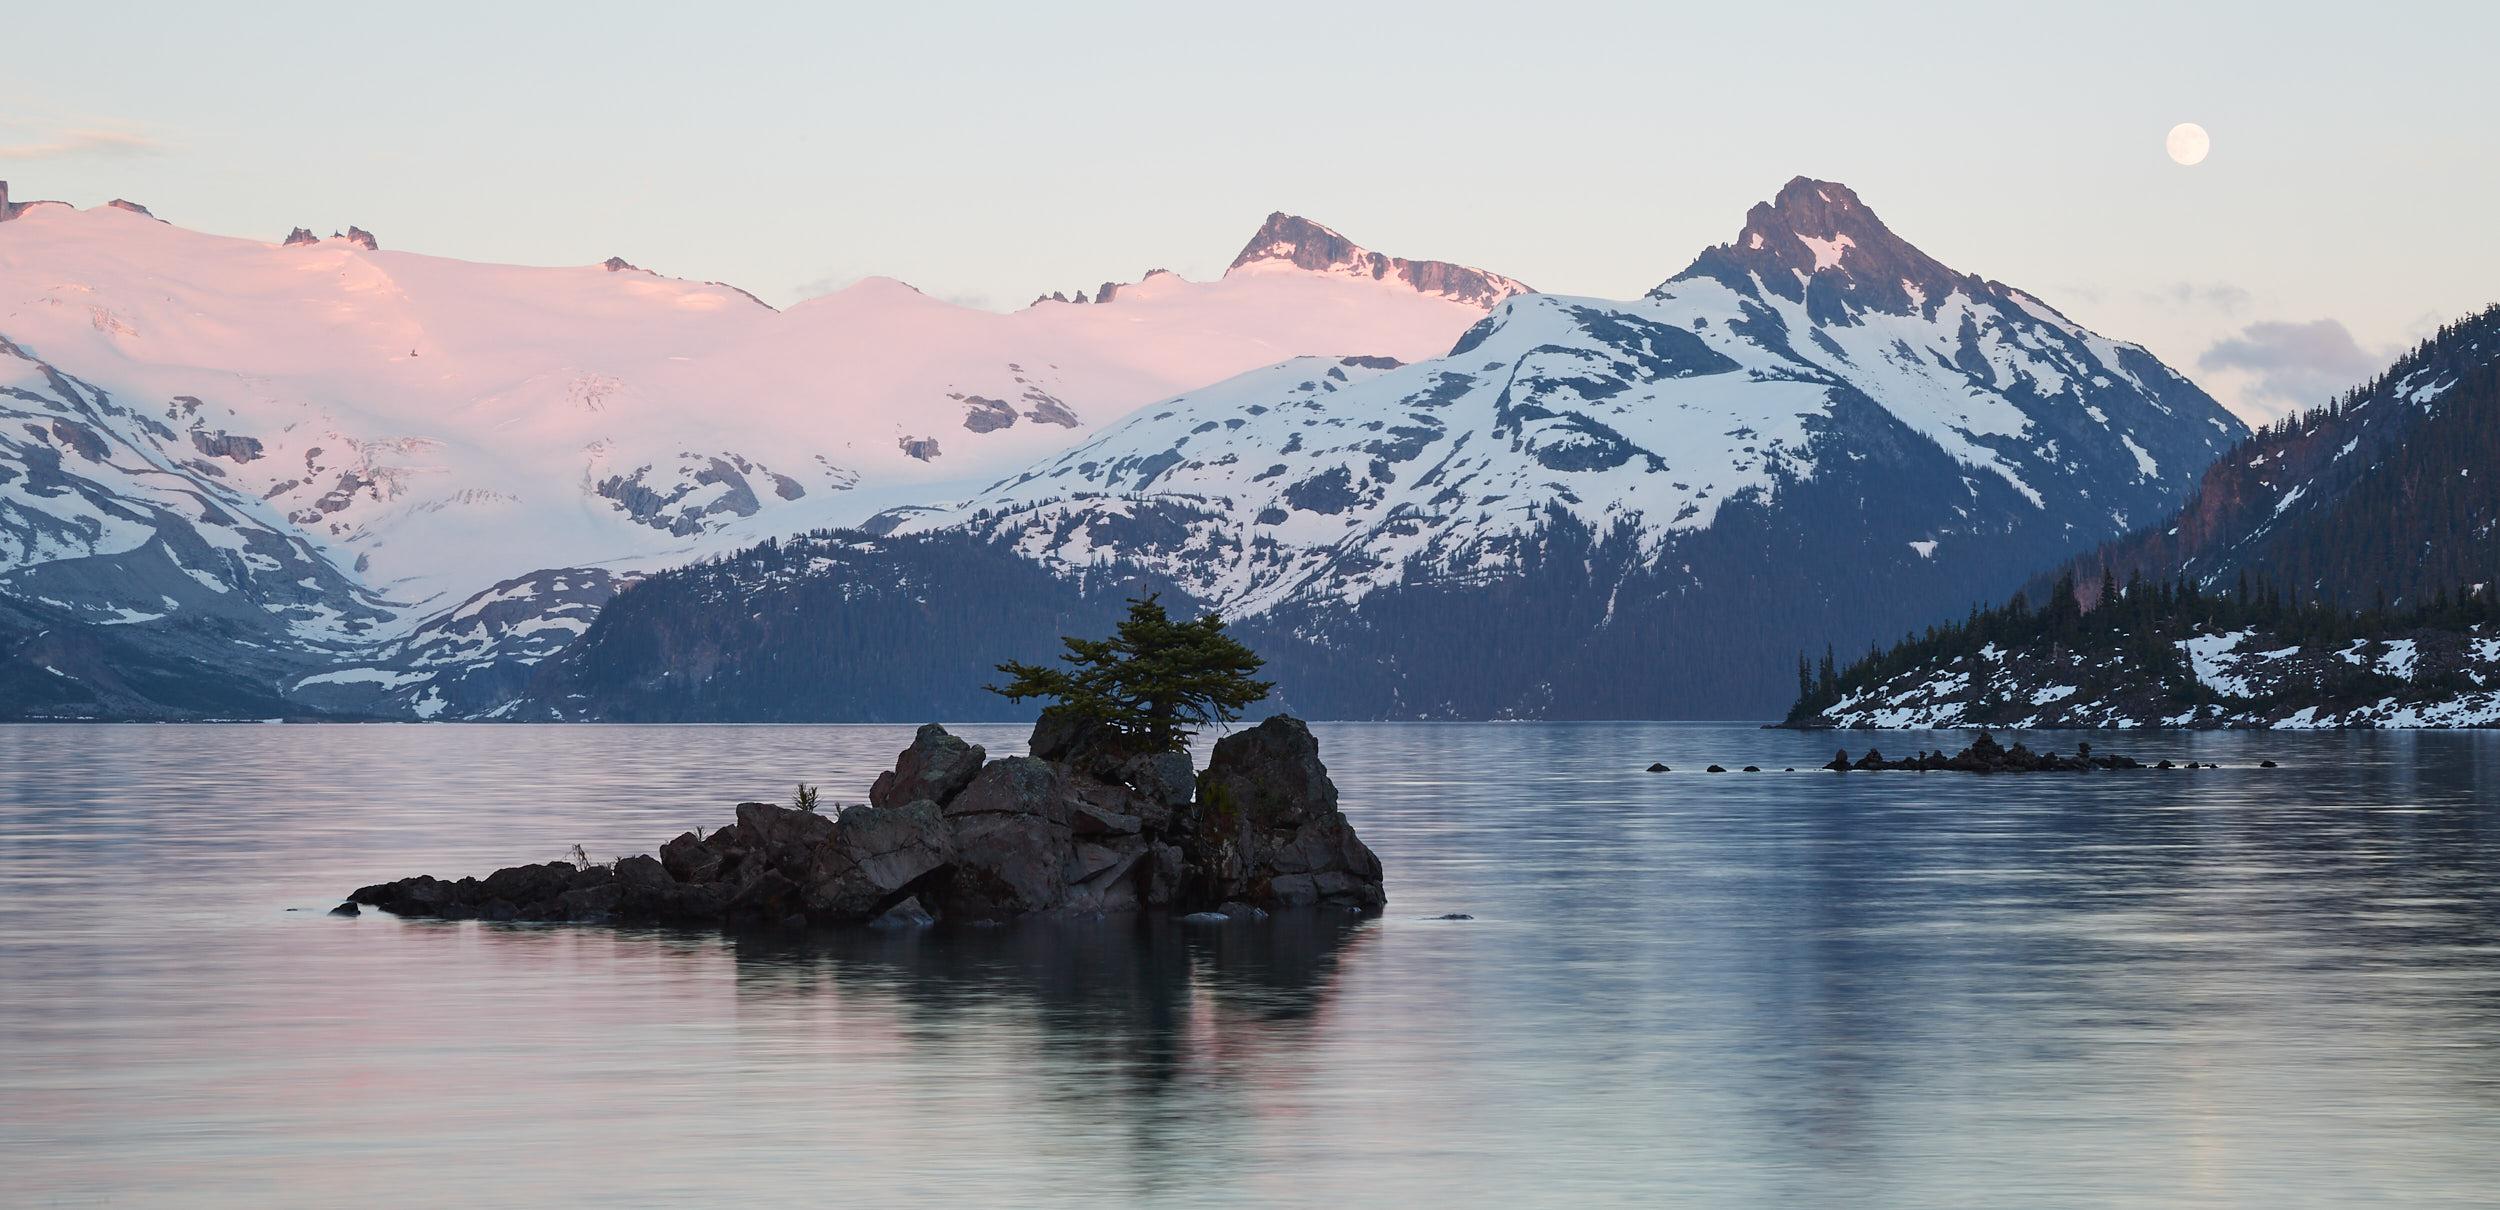 Camping at Garibaldi Lake 8.jpg